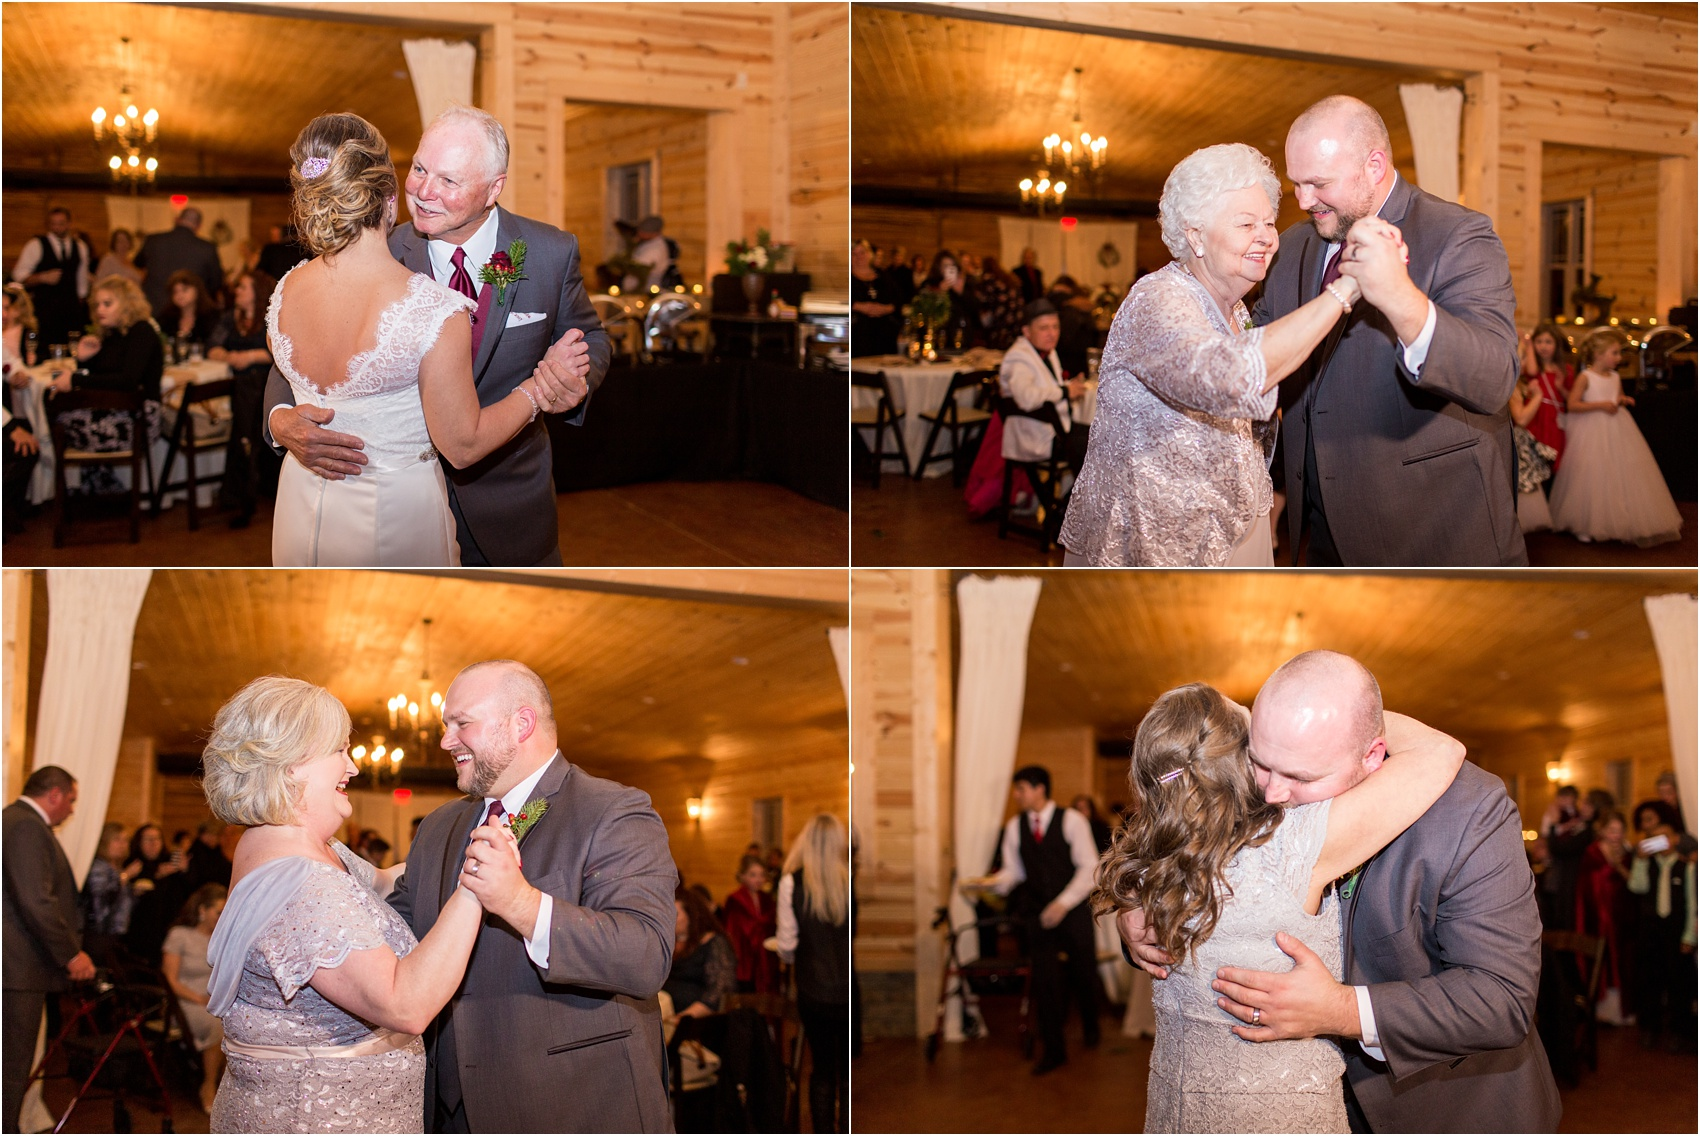 Savannah Eve Photography- Page Wedding Blog-86.jpg